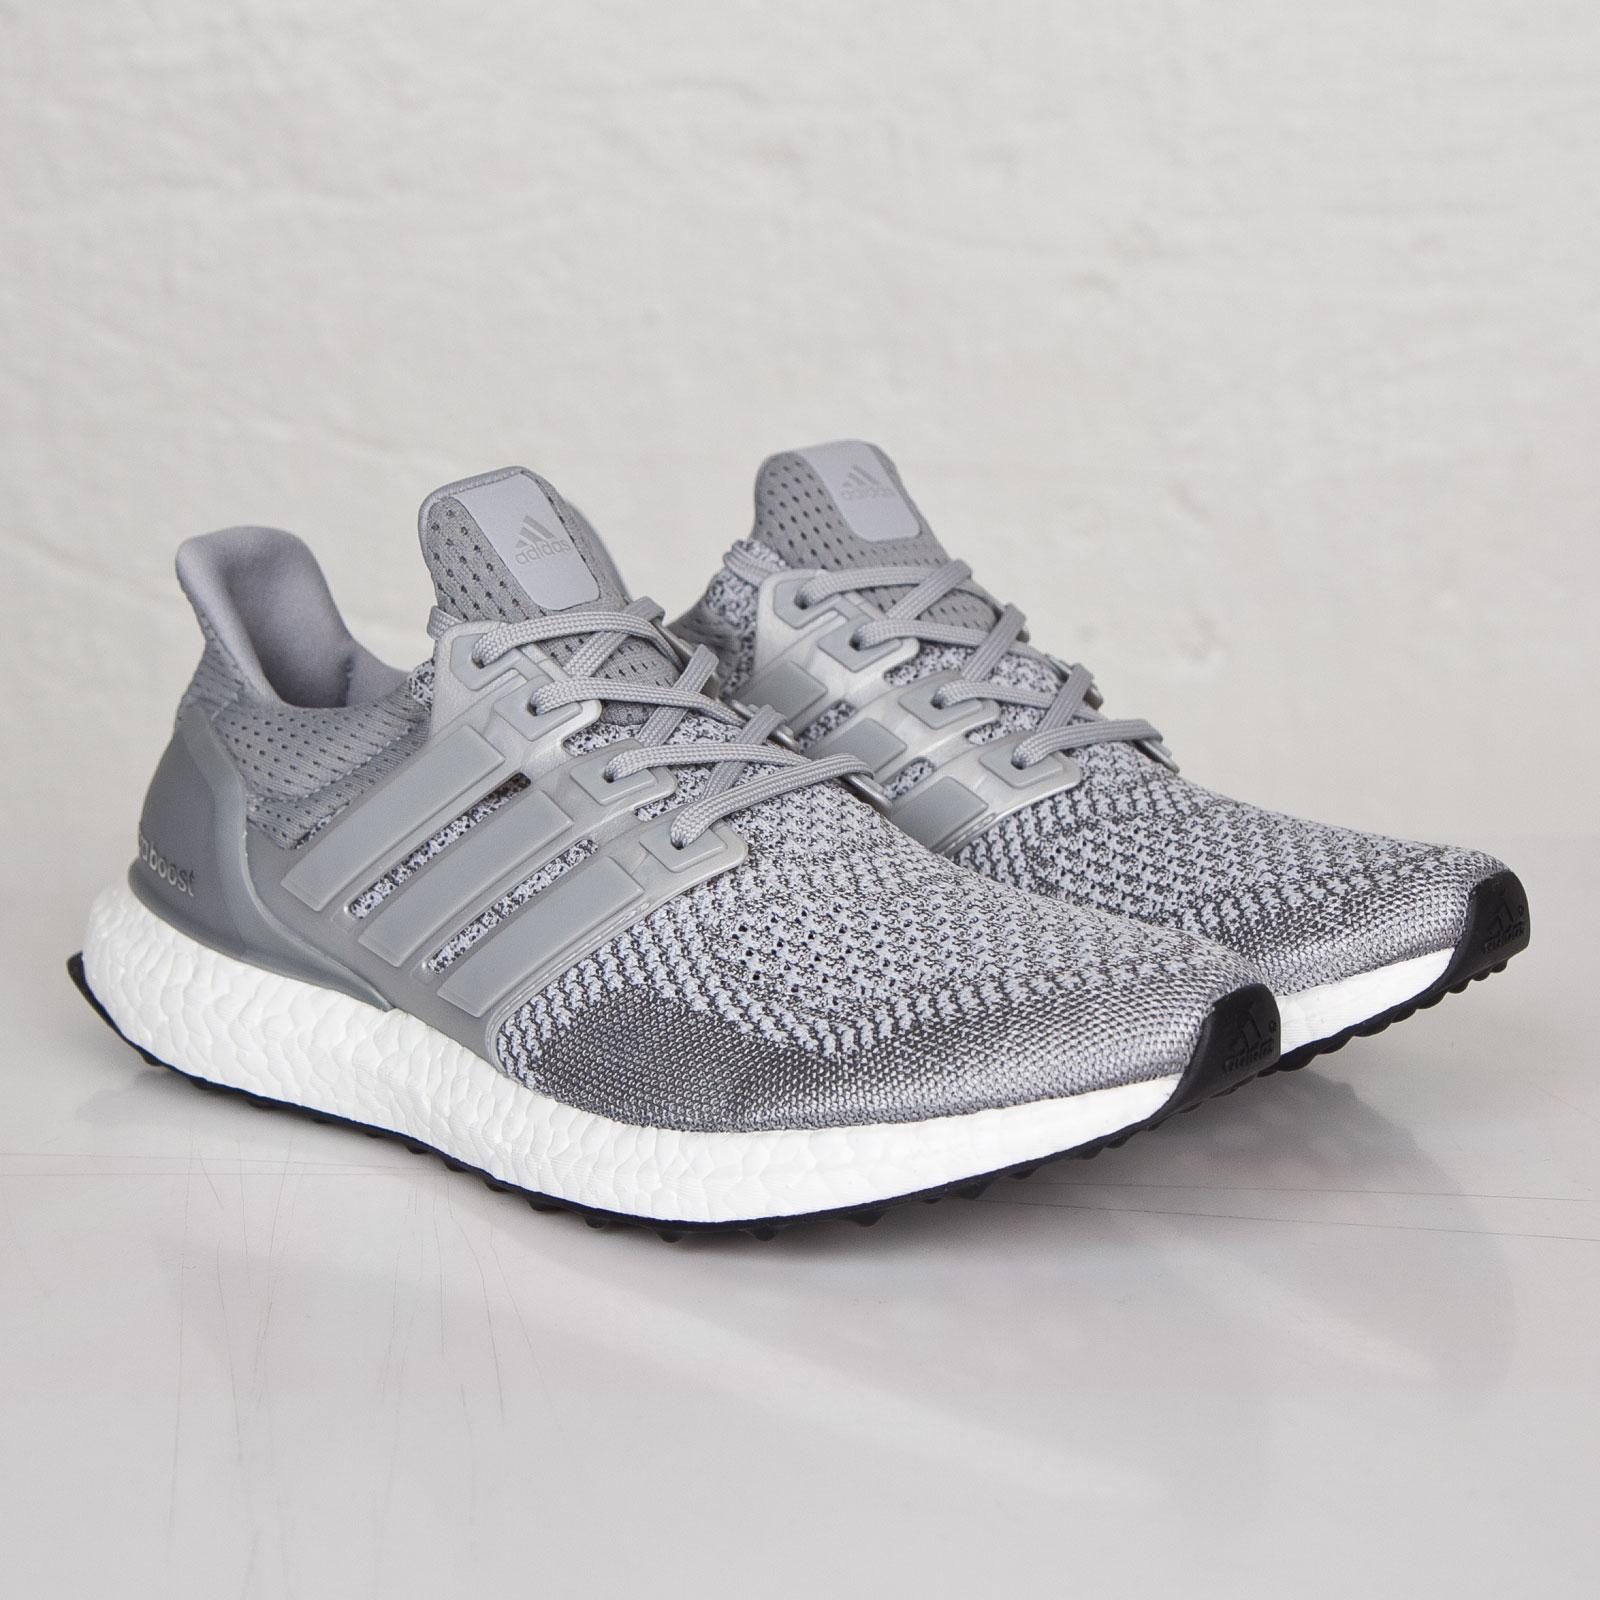 d7d25e20124 adidas Ultra Boost Ltd - S77517 - Sneakersnstuff